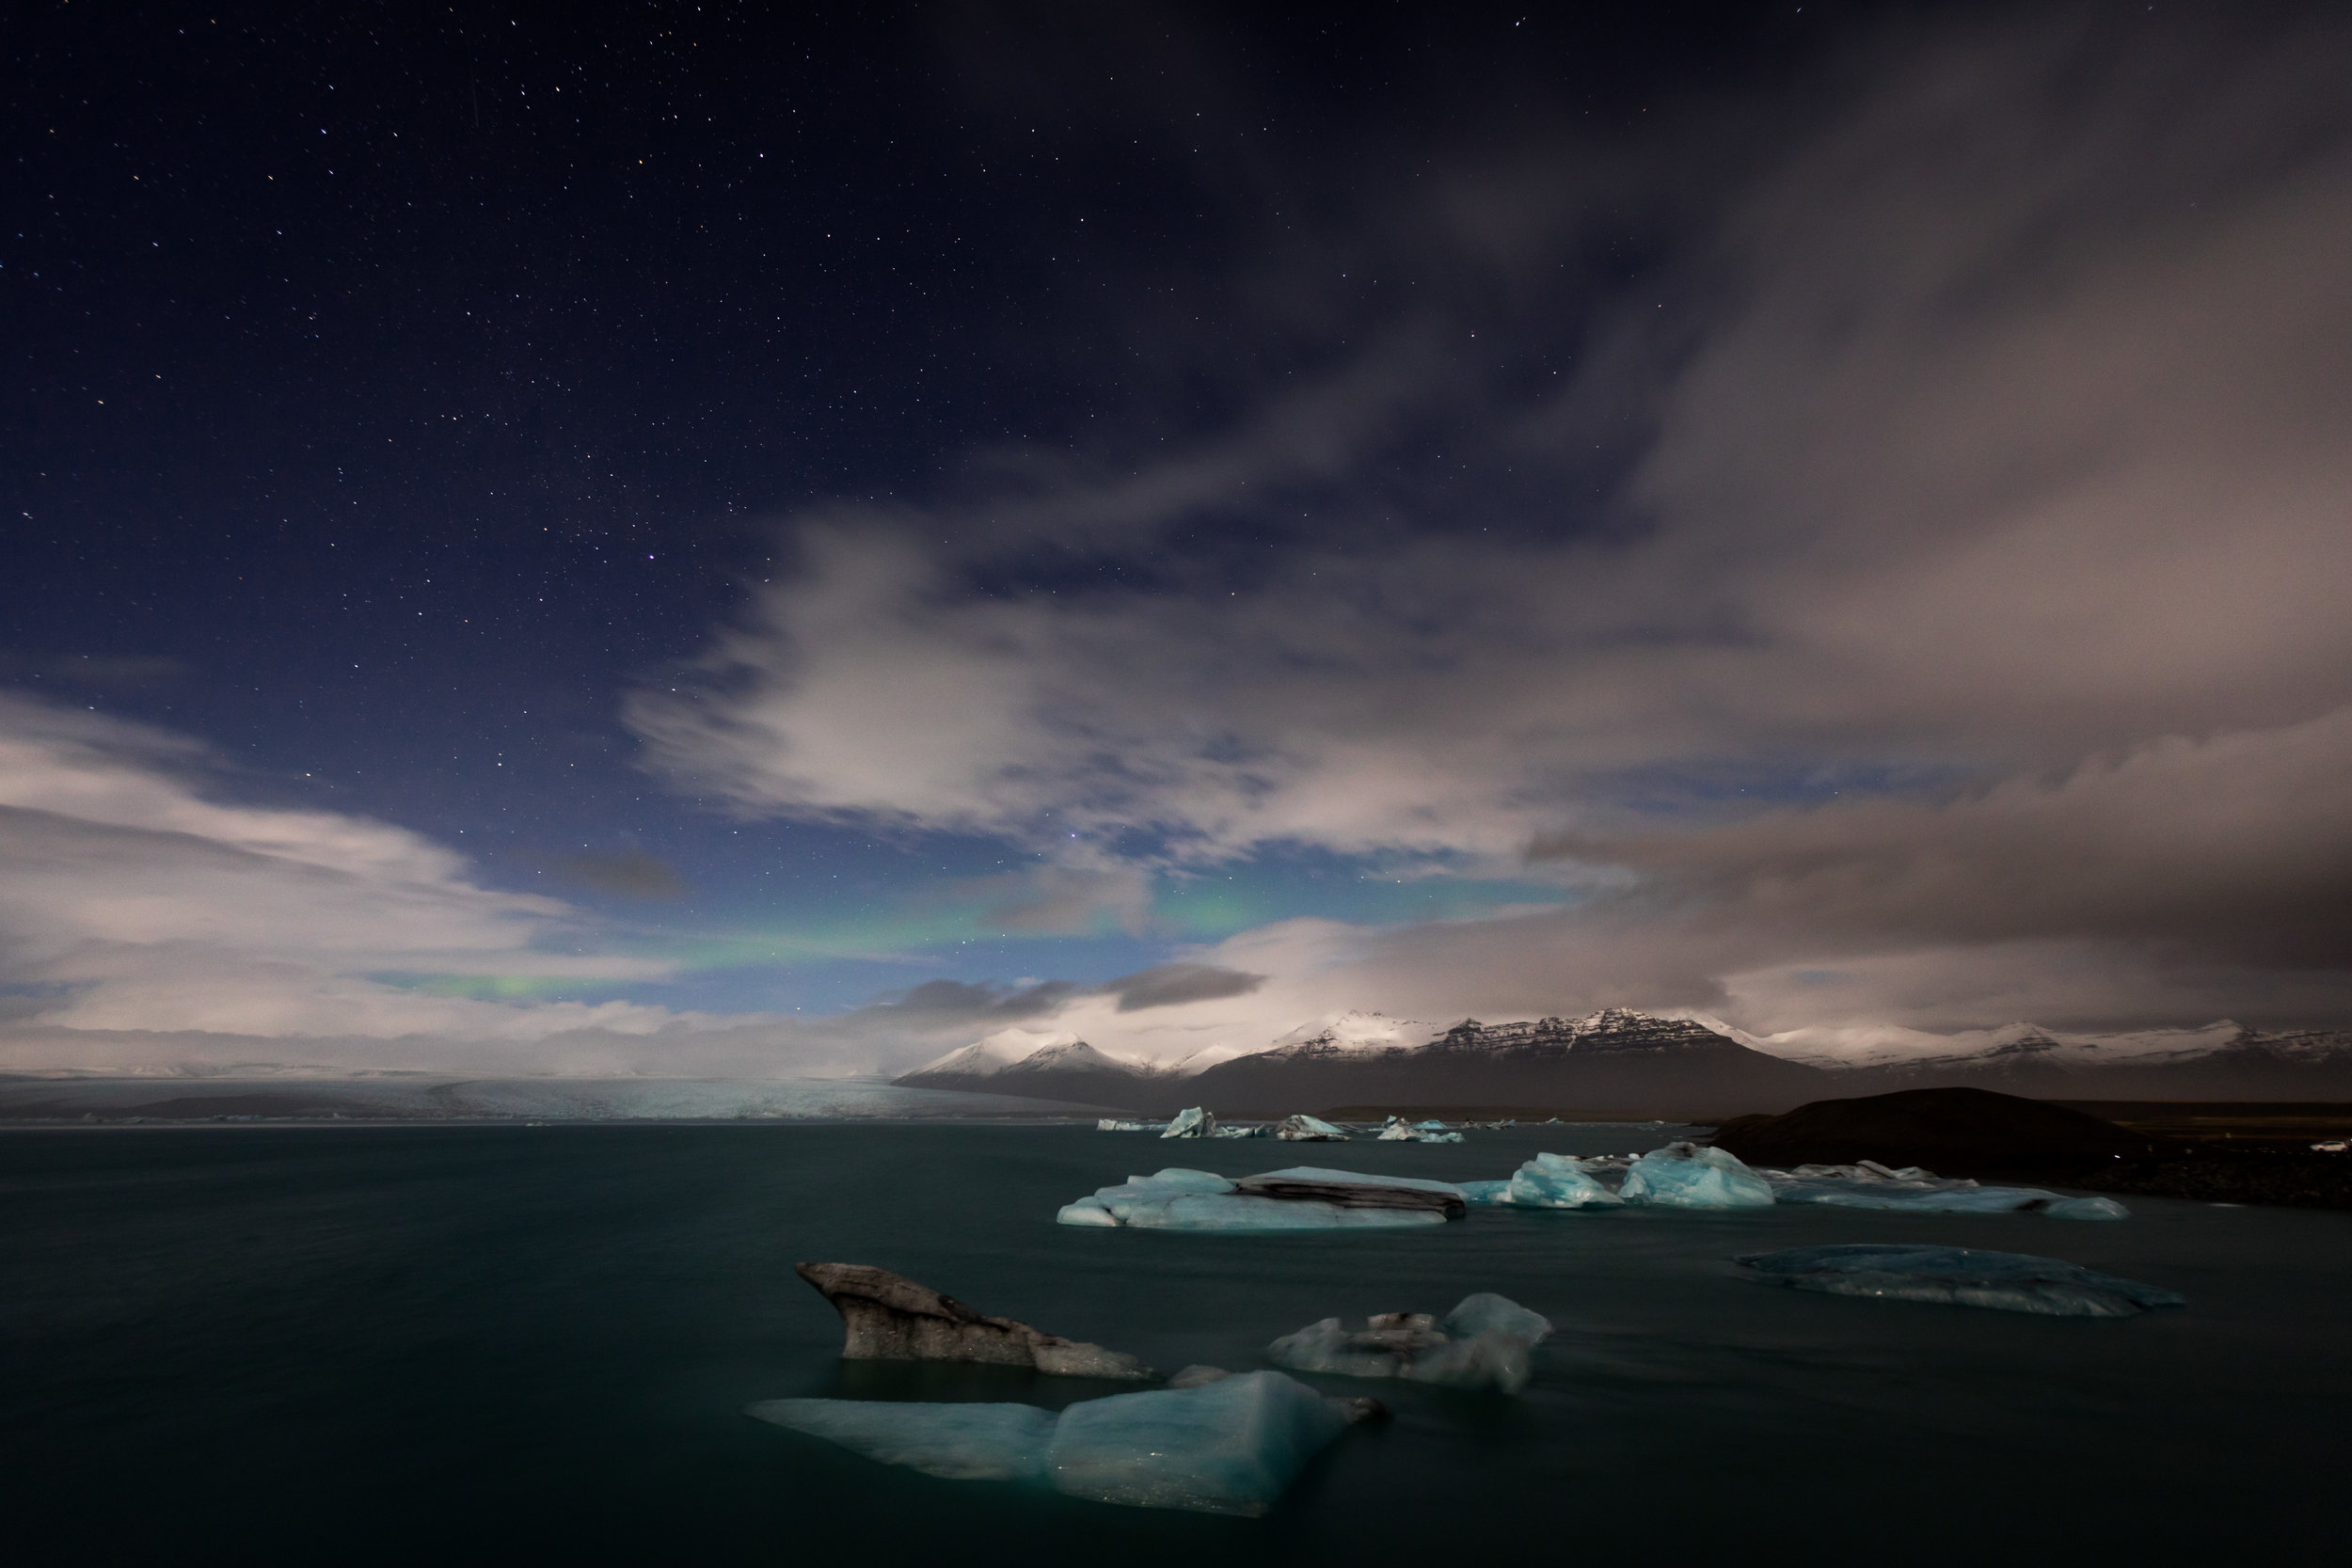 aqm-iceland-20170205-1731.jpg